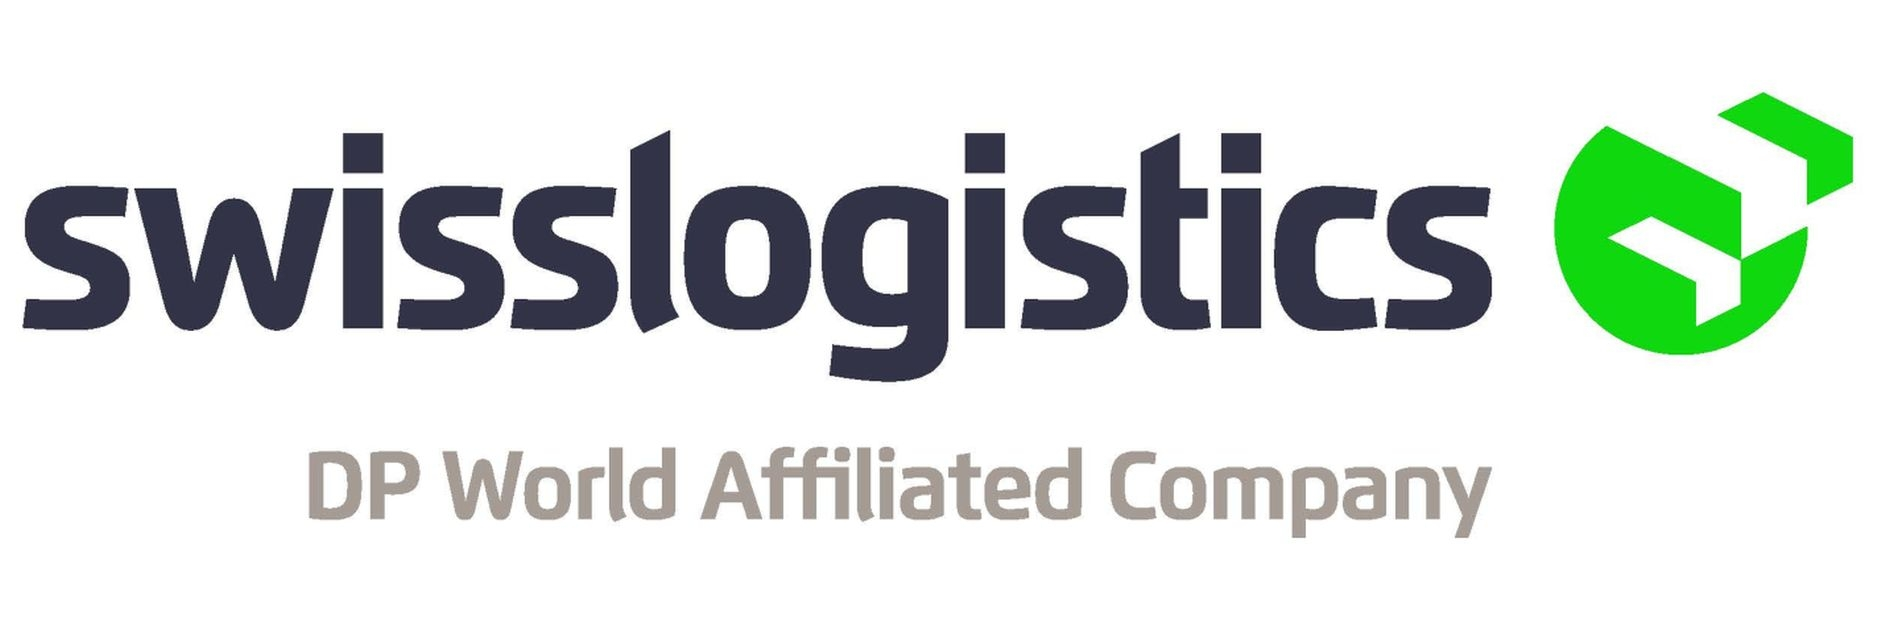 swisslogistics DP World Affiliated Company